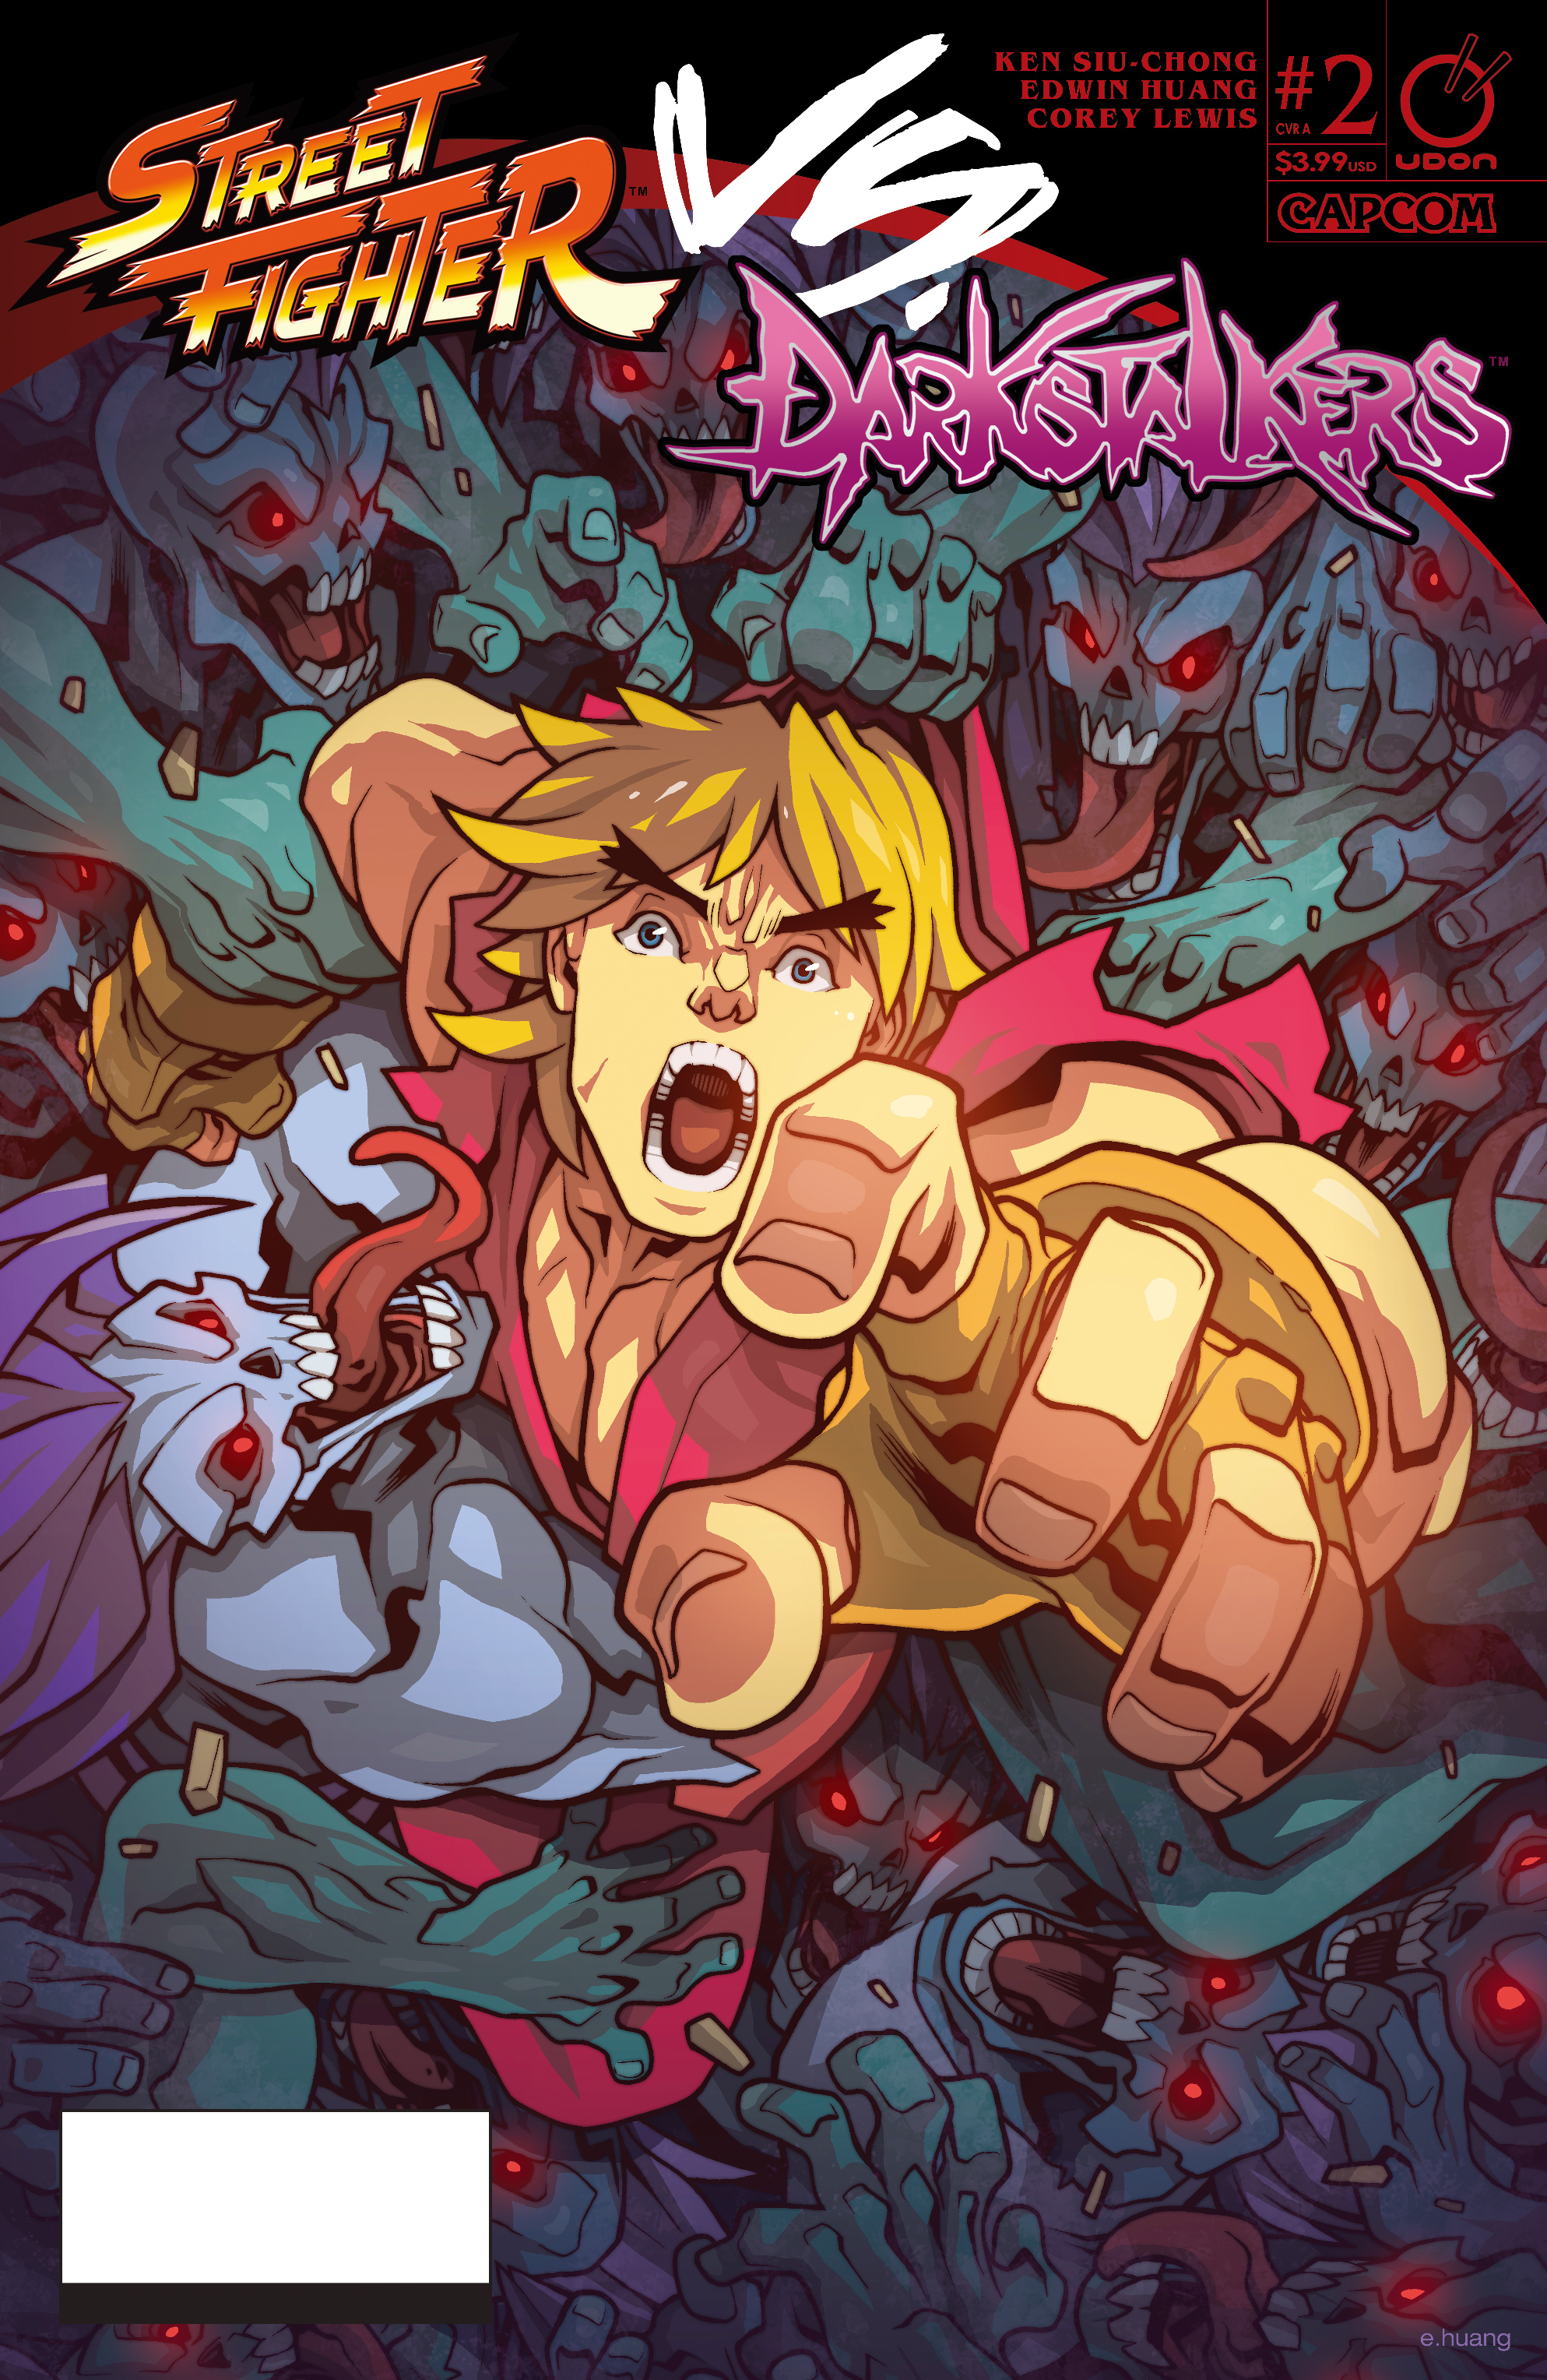 Read online Street Fighter VS Darkstalkers comic -  Issue #2 - 1